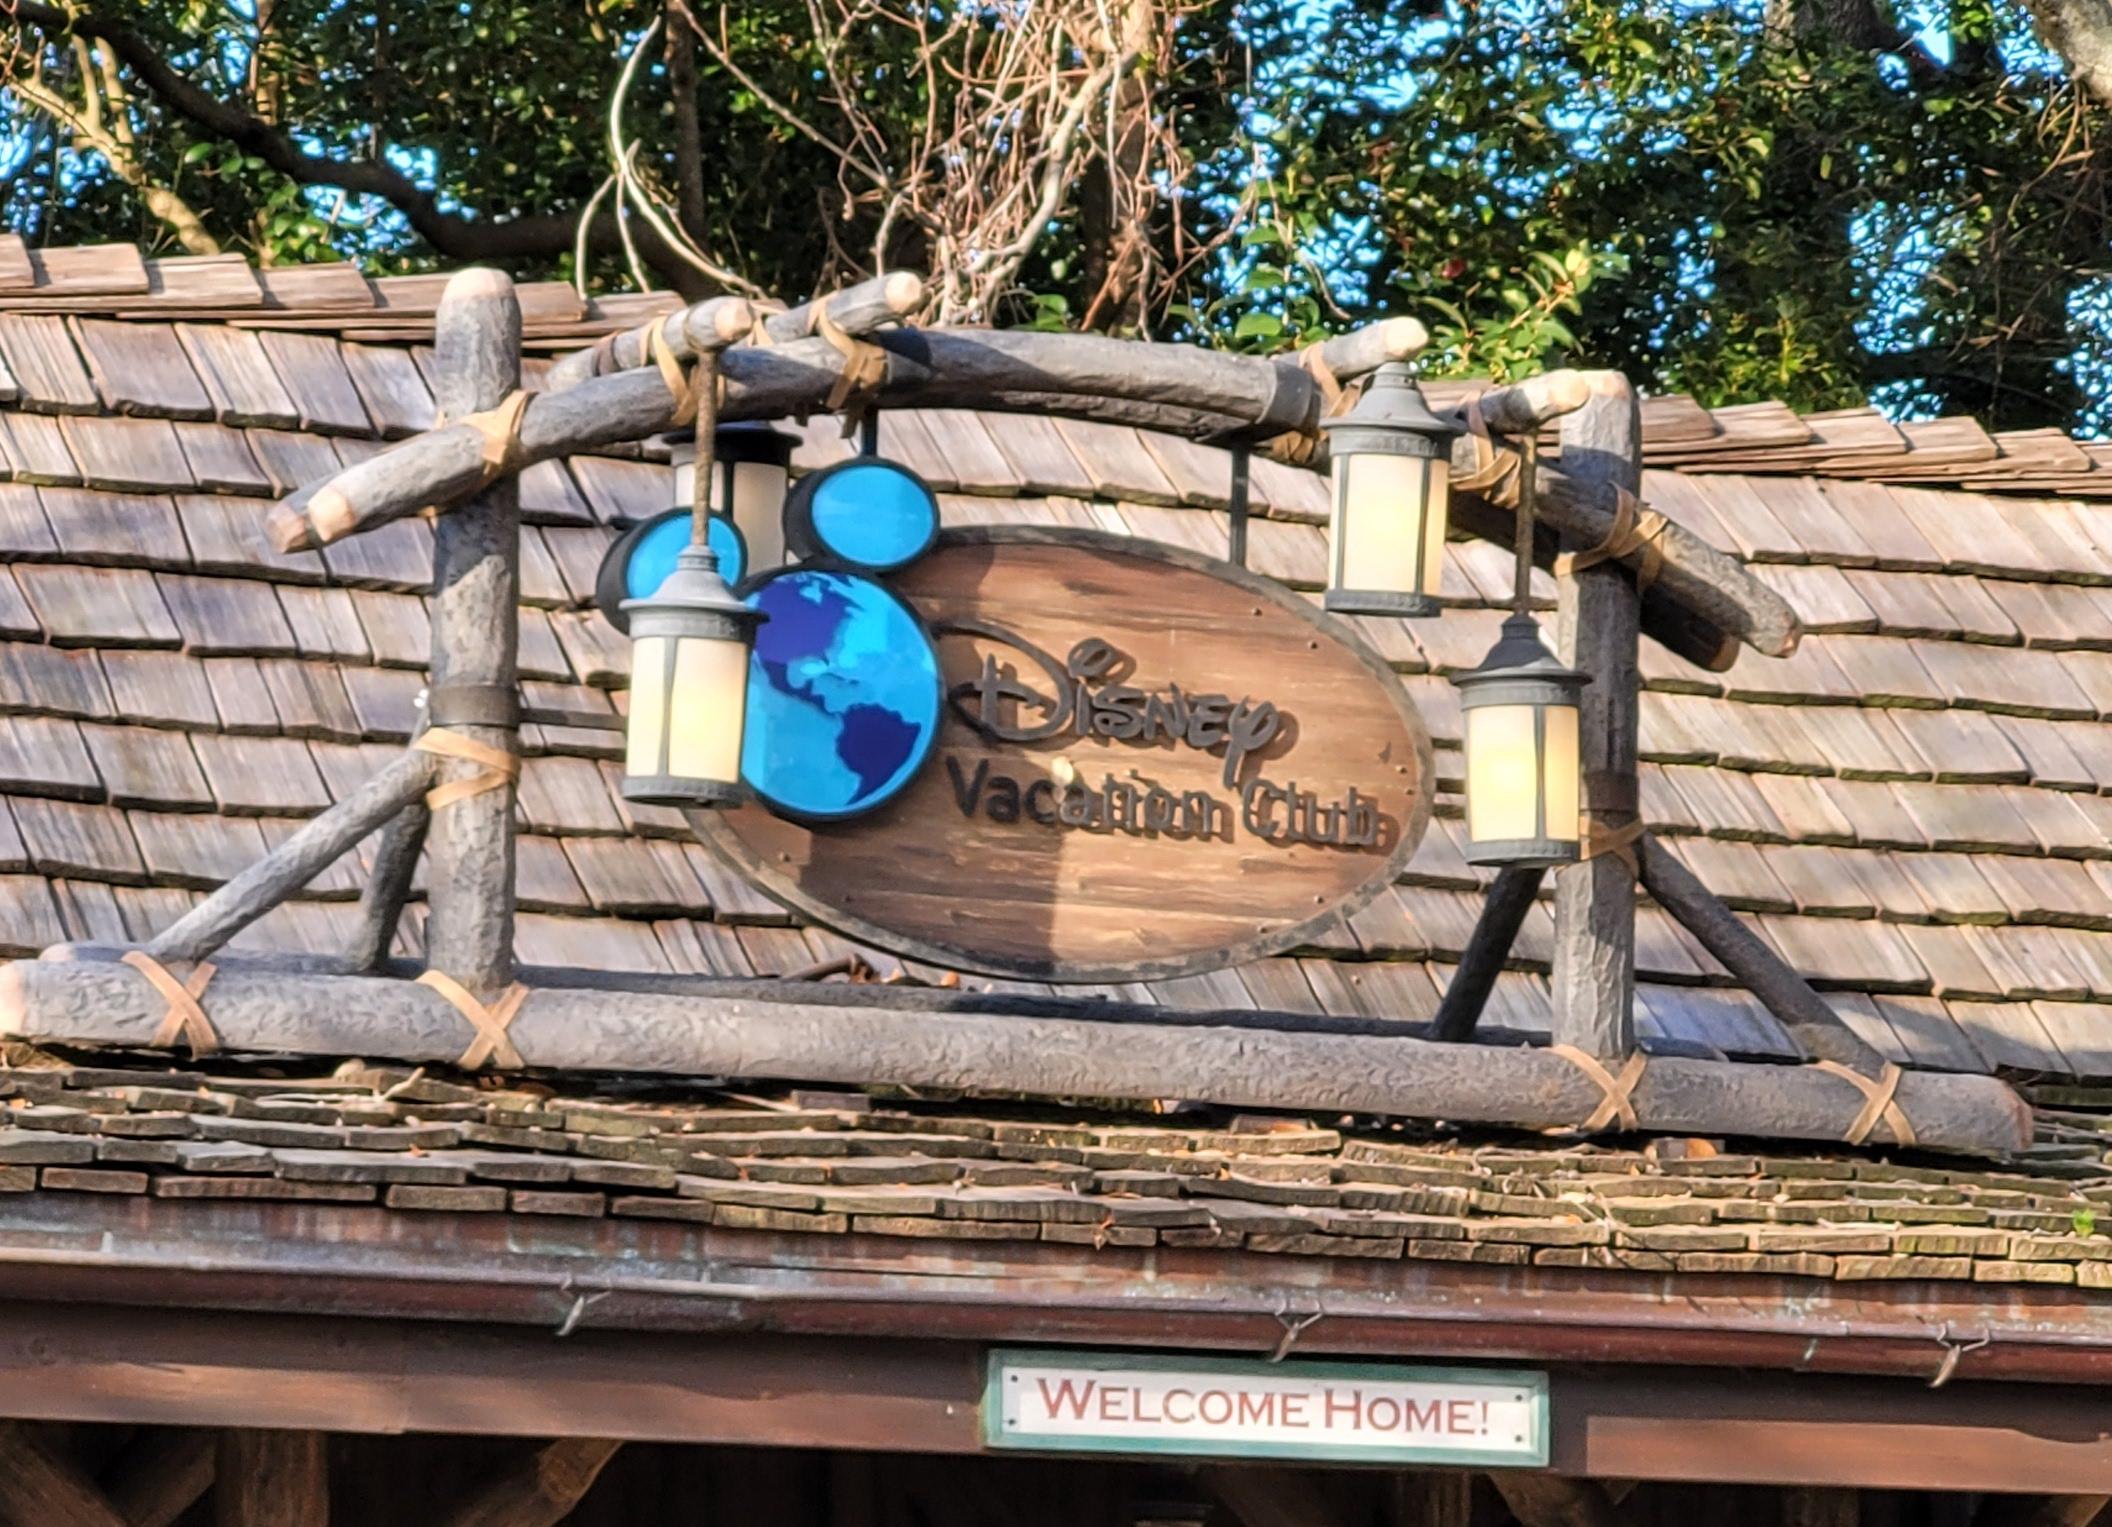 Disney Vacation Club DVC Sign in World Showcase